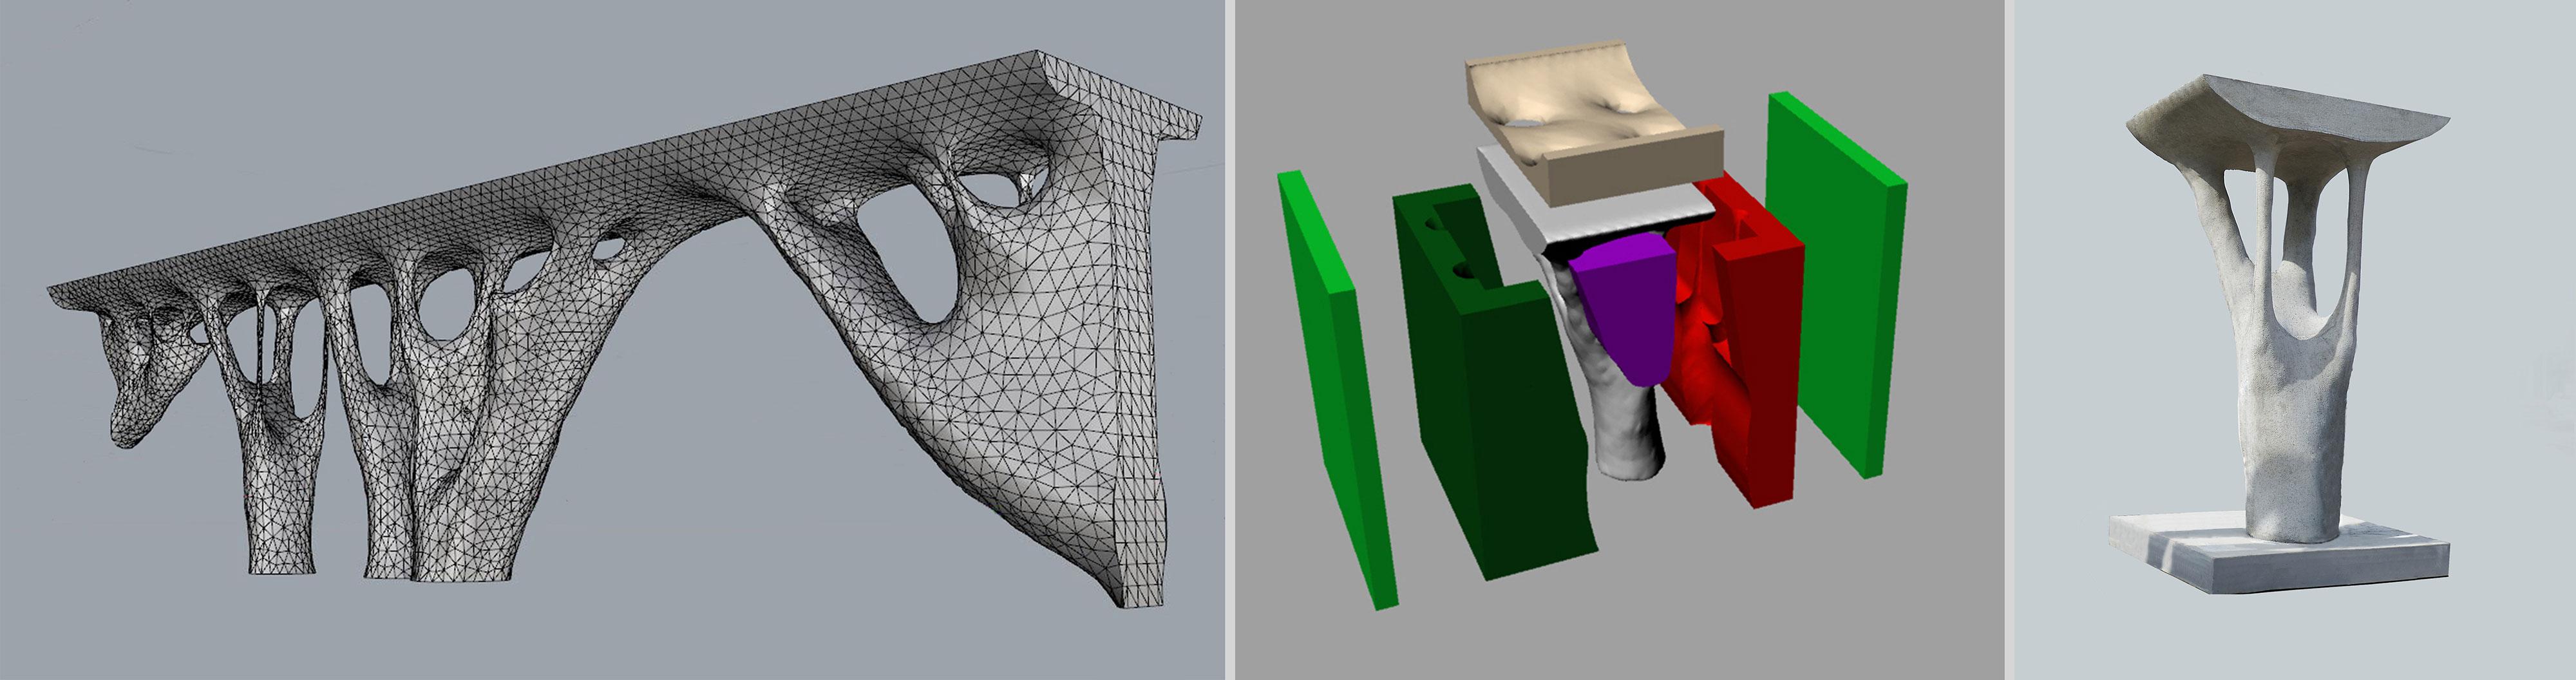 Eso Concrete Design, Fietsbrug 2014-2015 i.s.m. TU/e & Cement en Betoncentrum